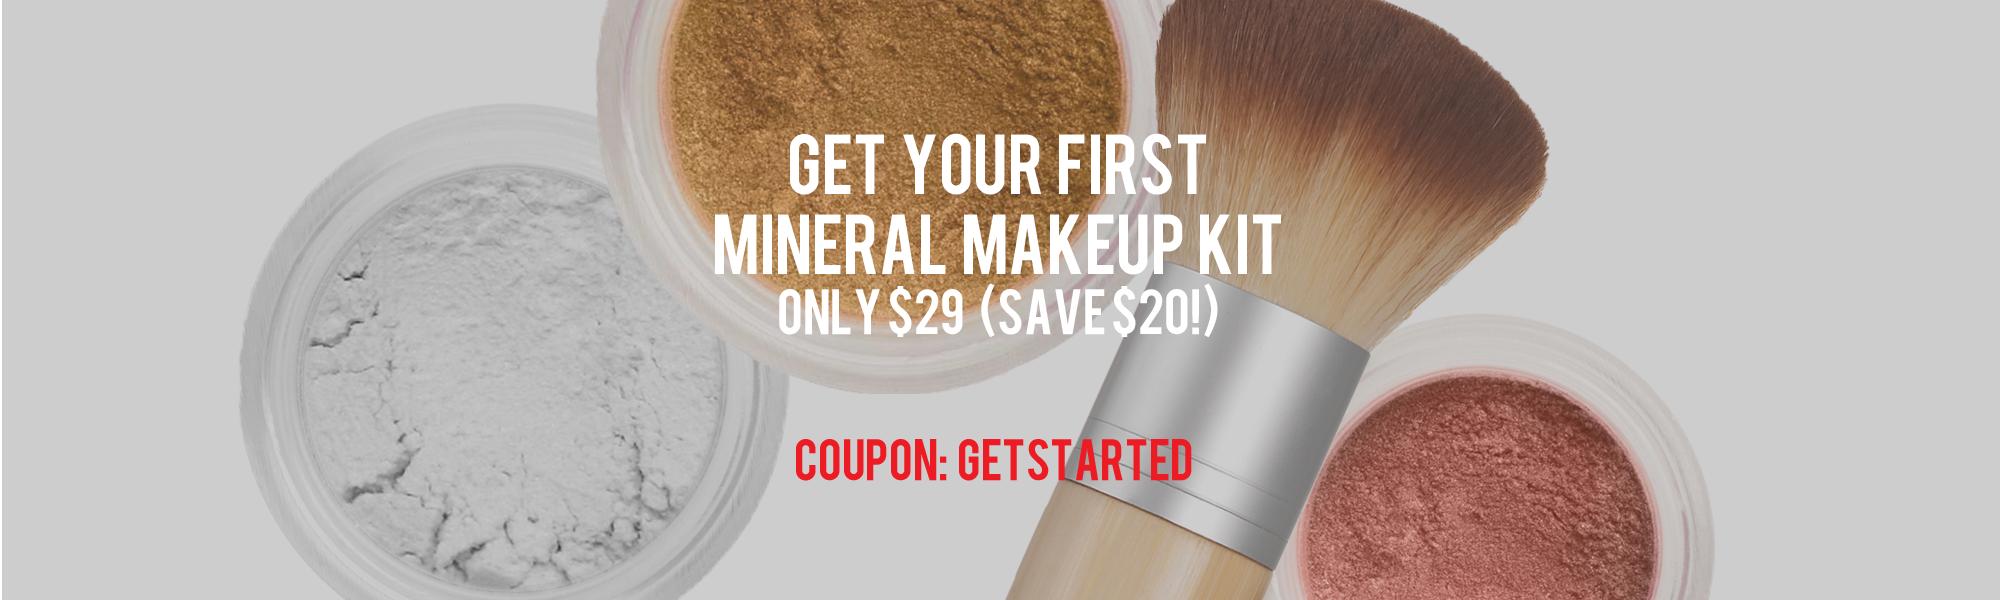 Sheer Miracle Mineral Makeup Starter Kit $29